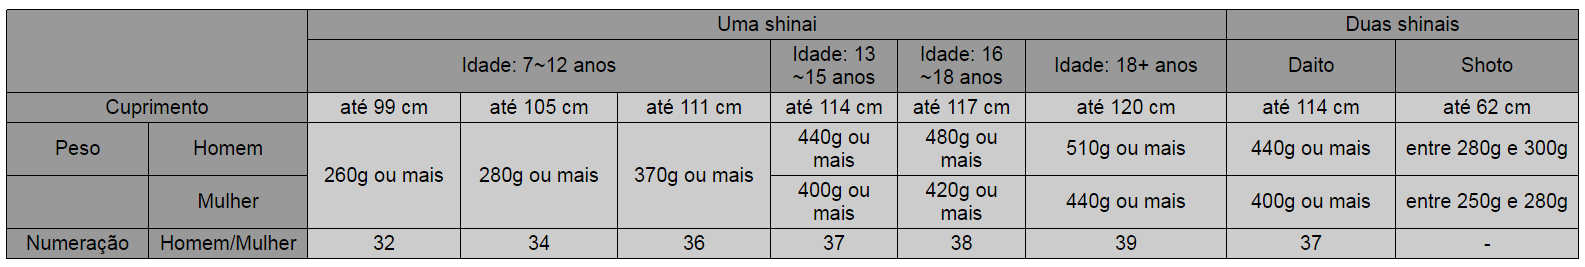 Tabela - Tamanho de shinai